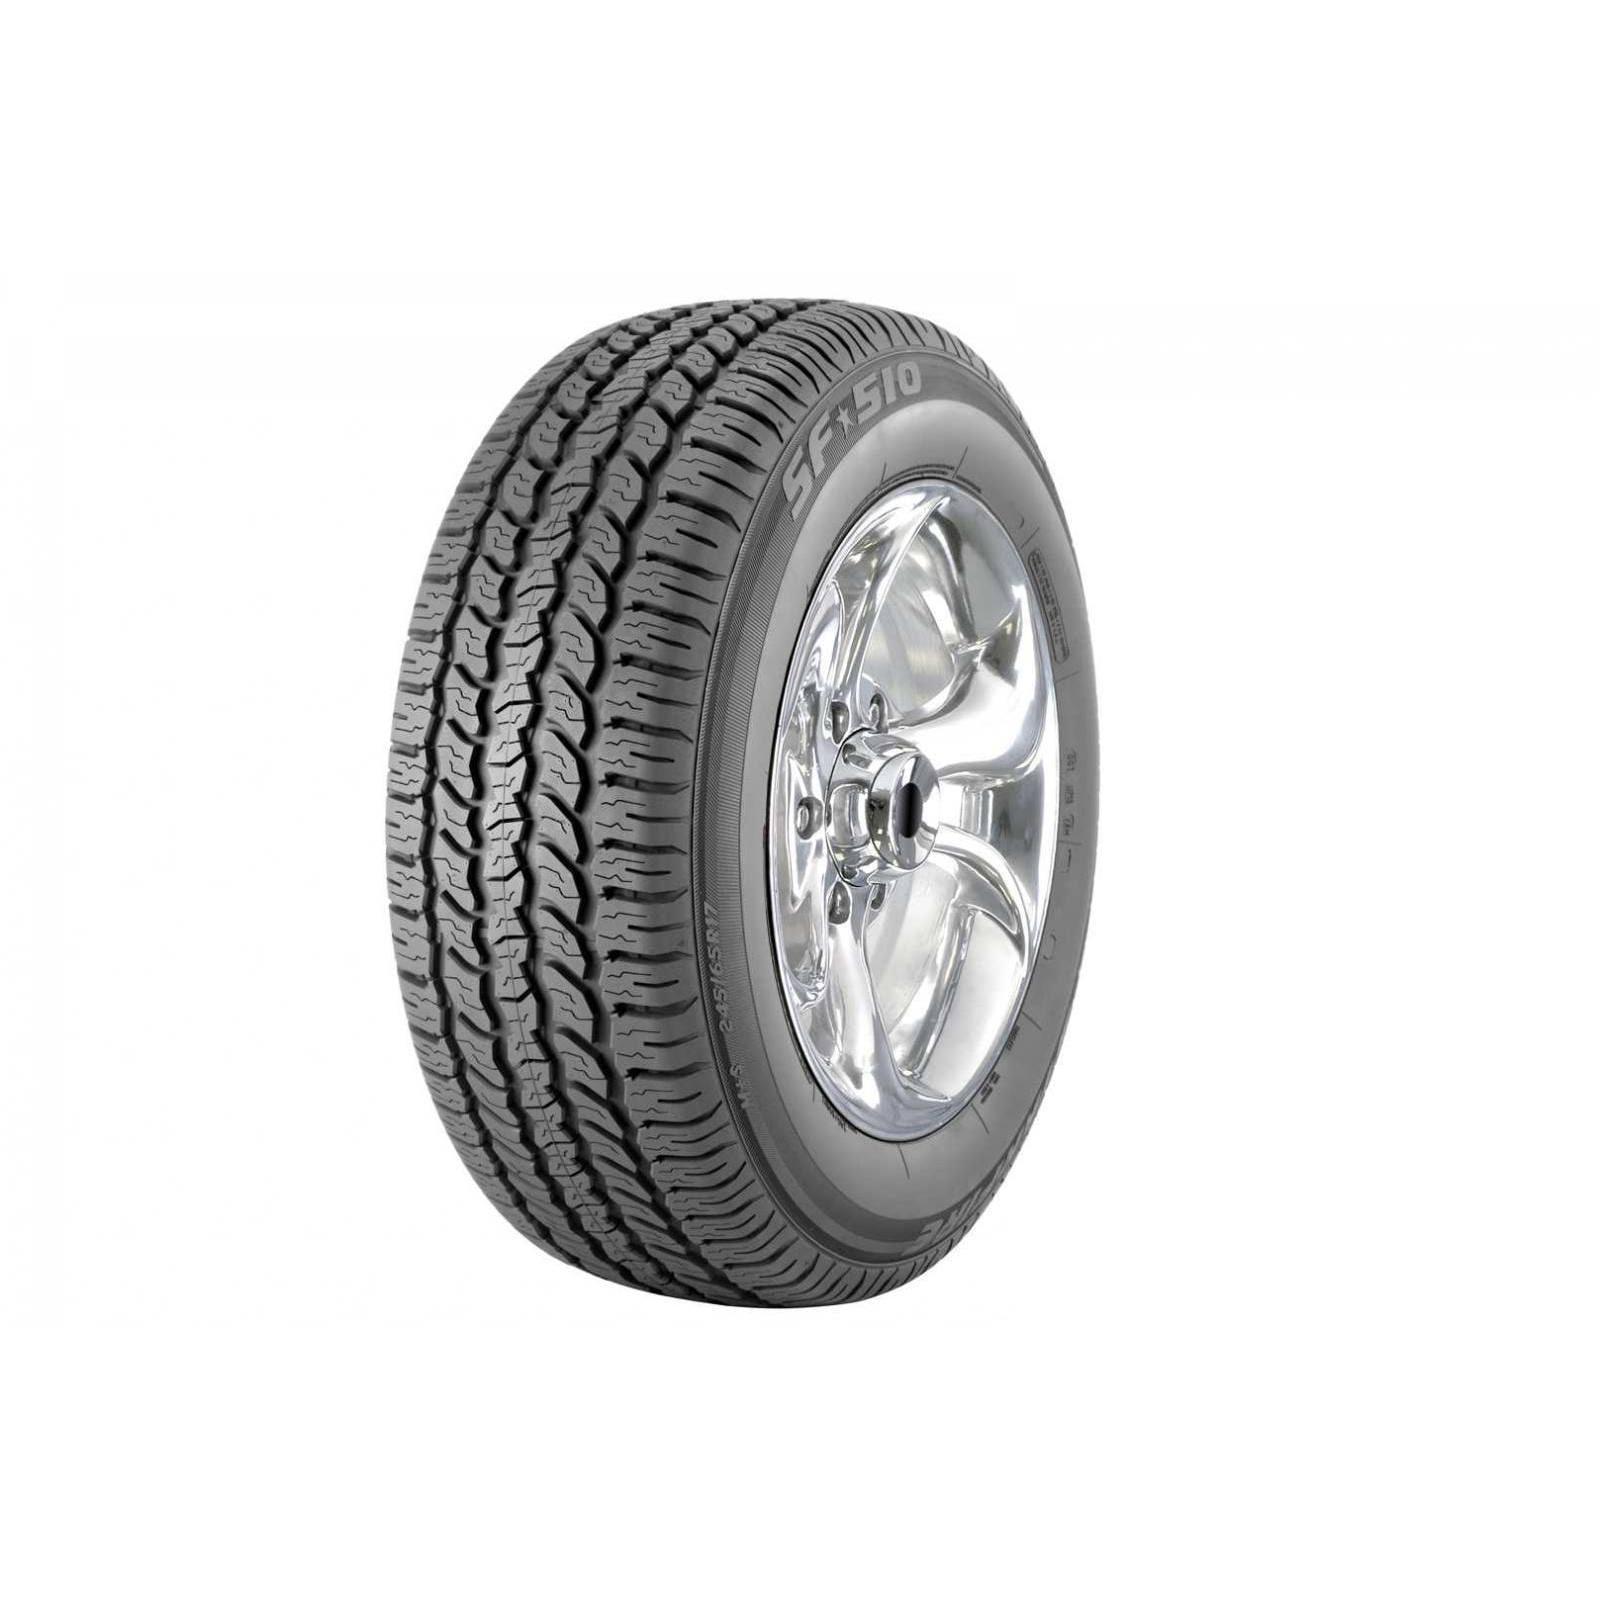 Starfire SF-510 LT All Season Tire - LT245/75R16 LRE/10 p...